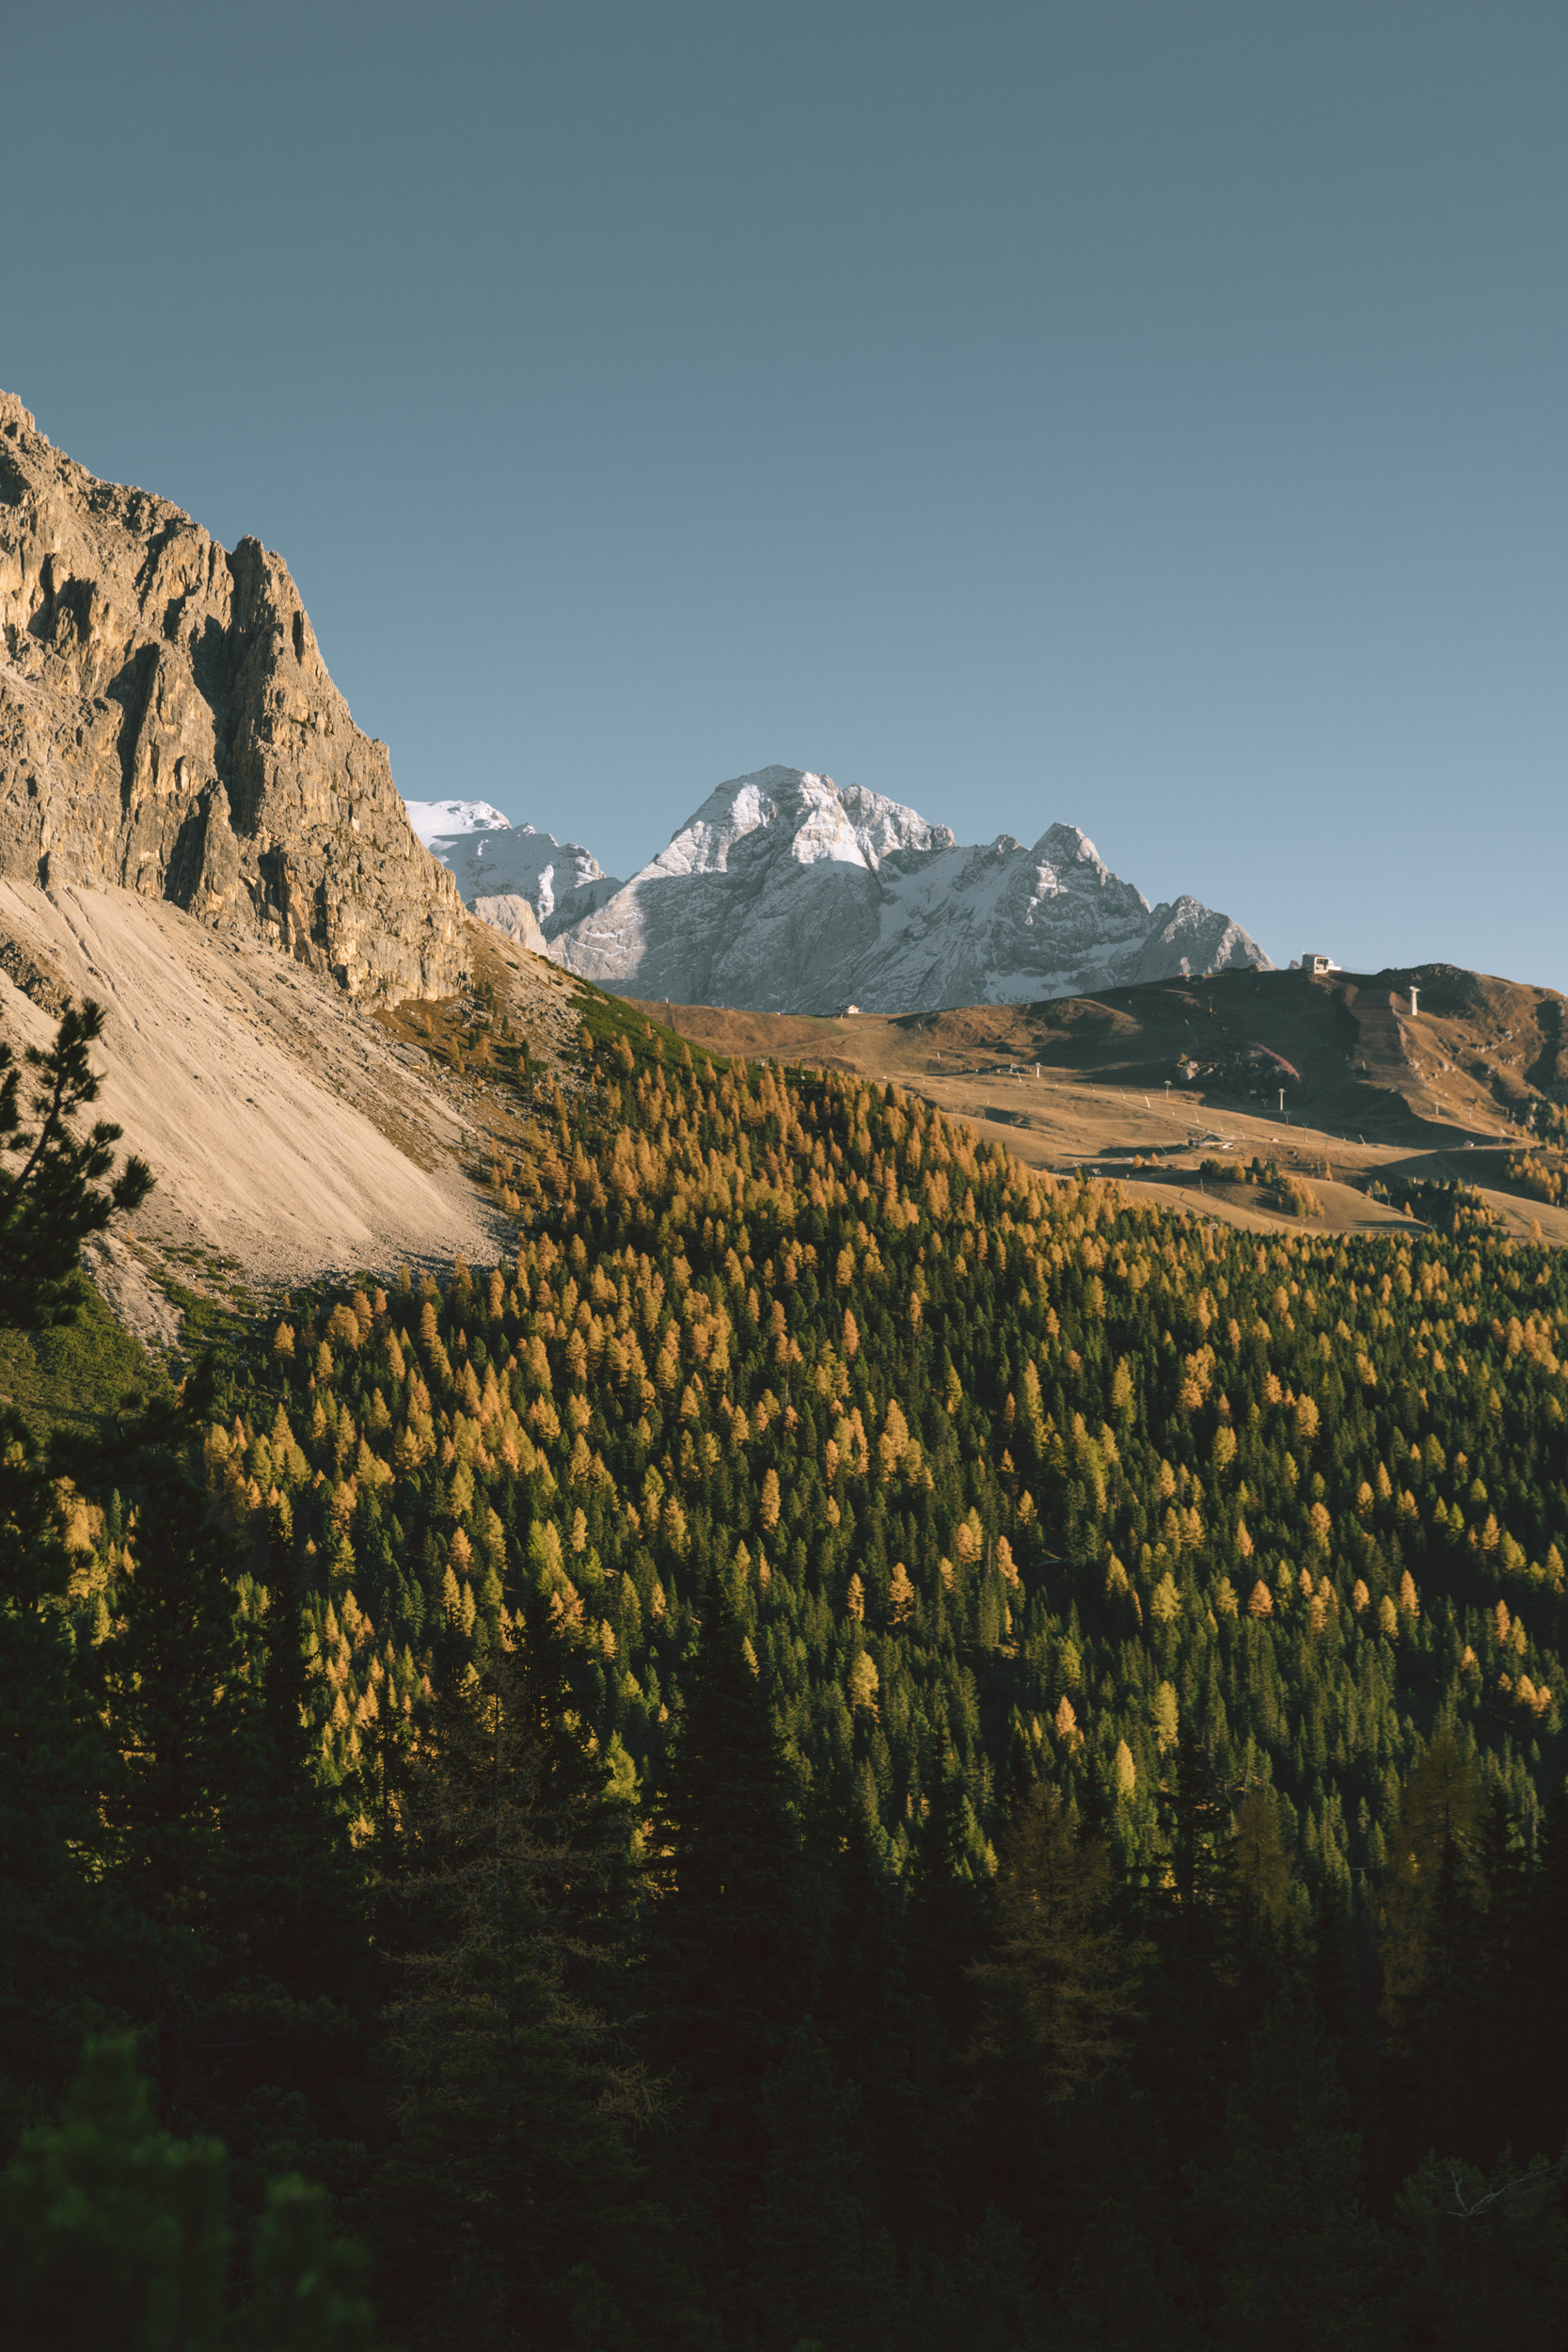 Val-Gardena-The-Dolomites-Italy-Autumn-Fall-October-2017.jpg